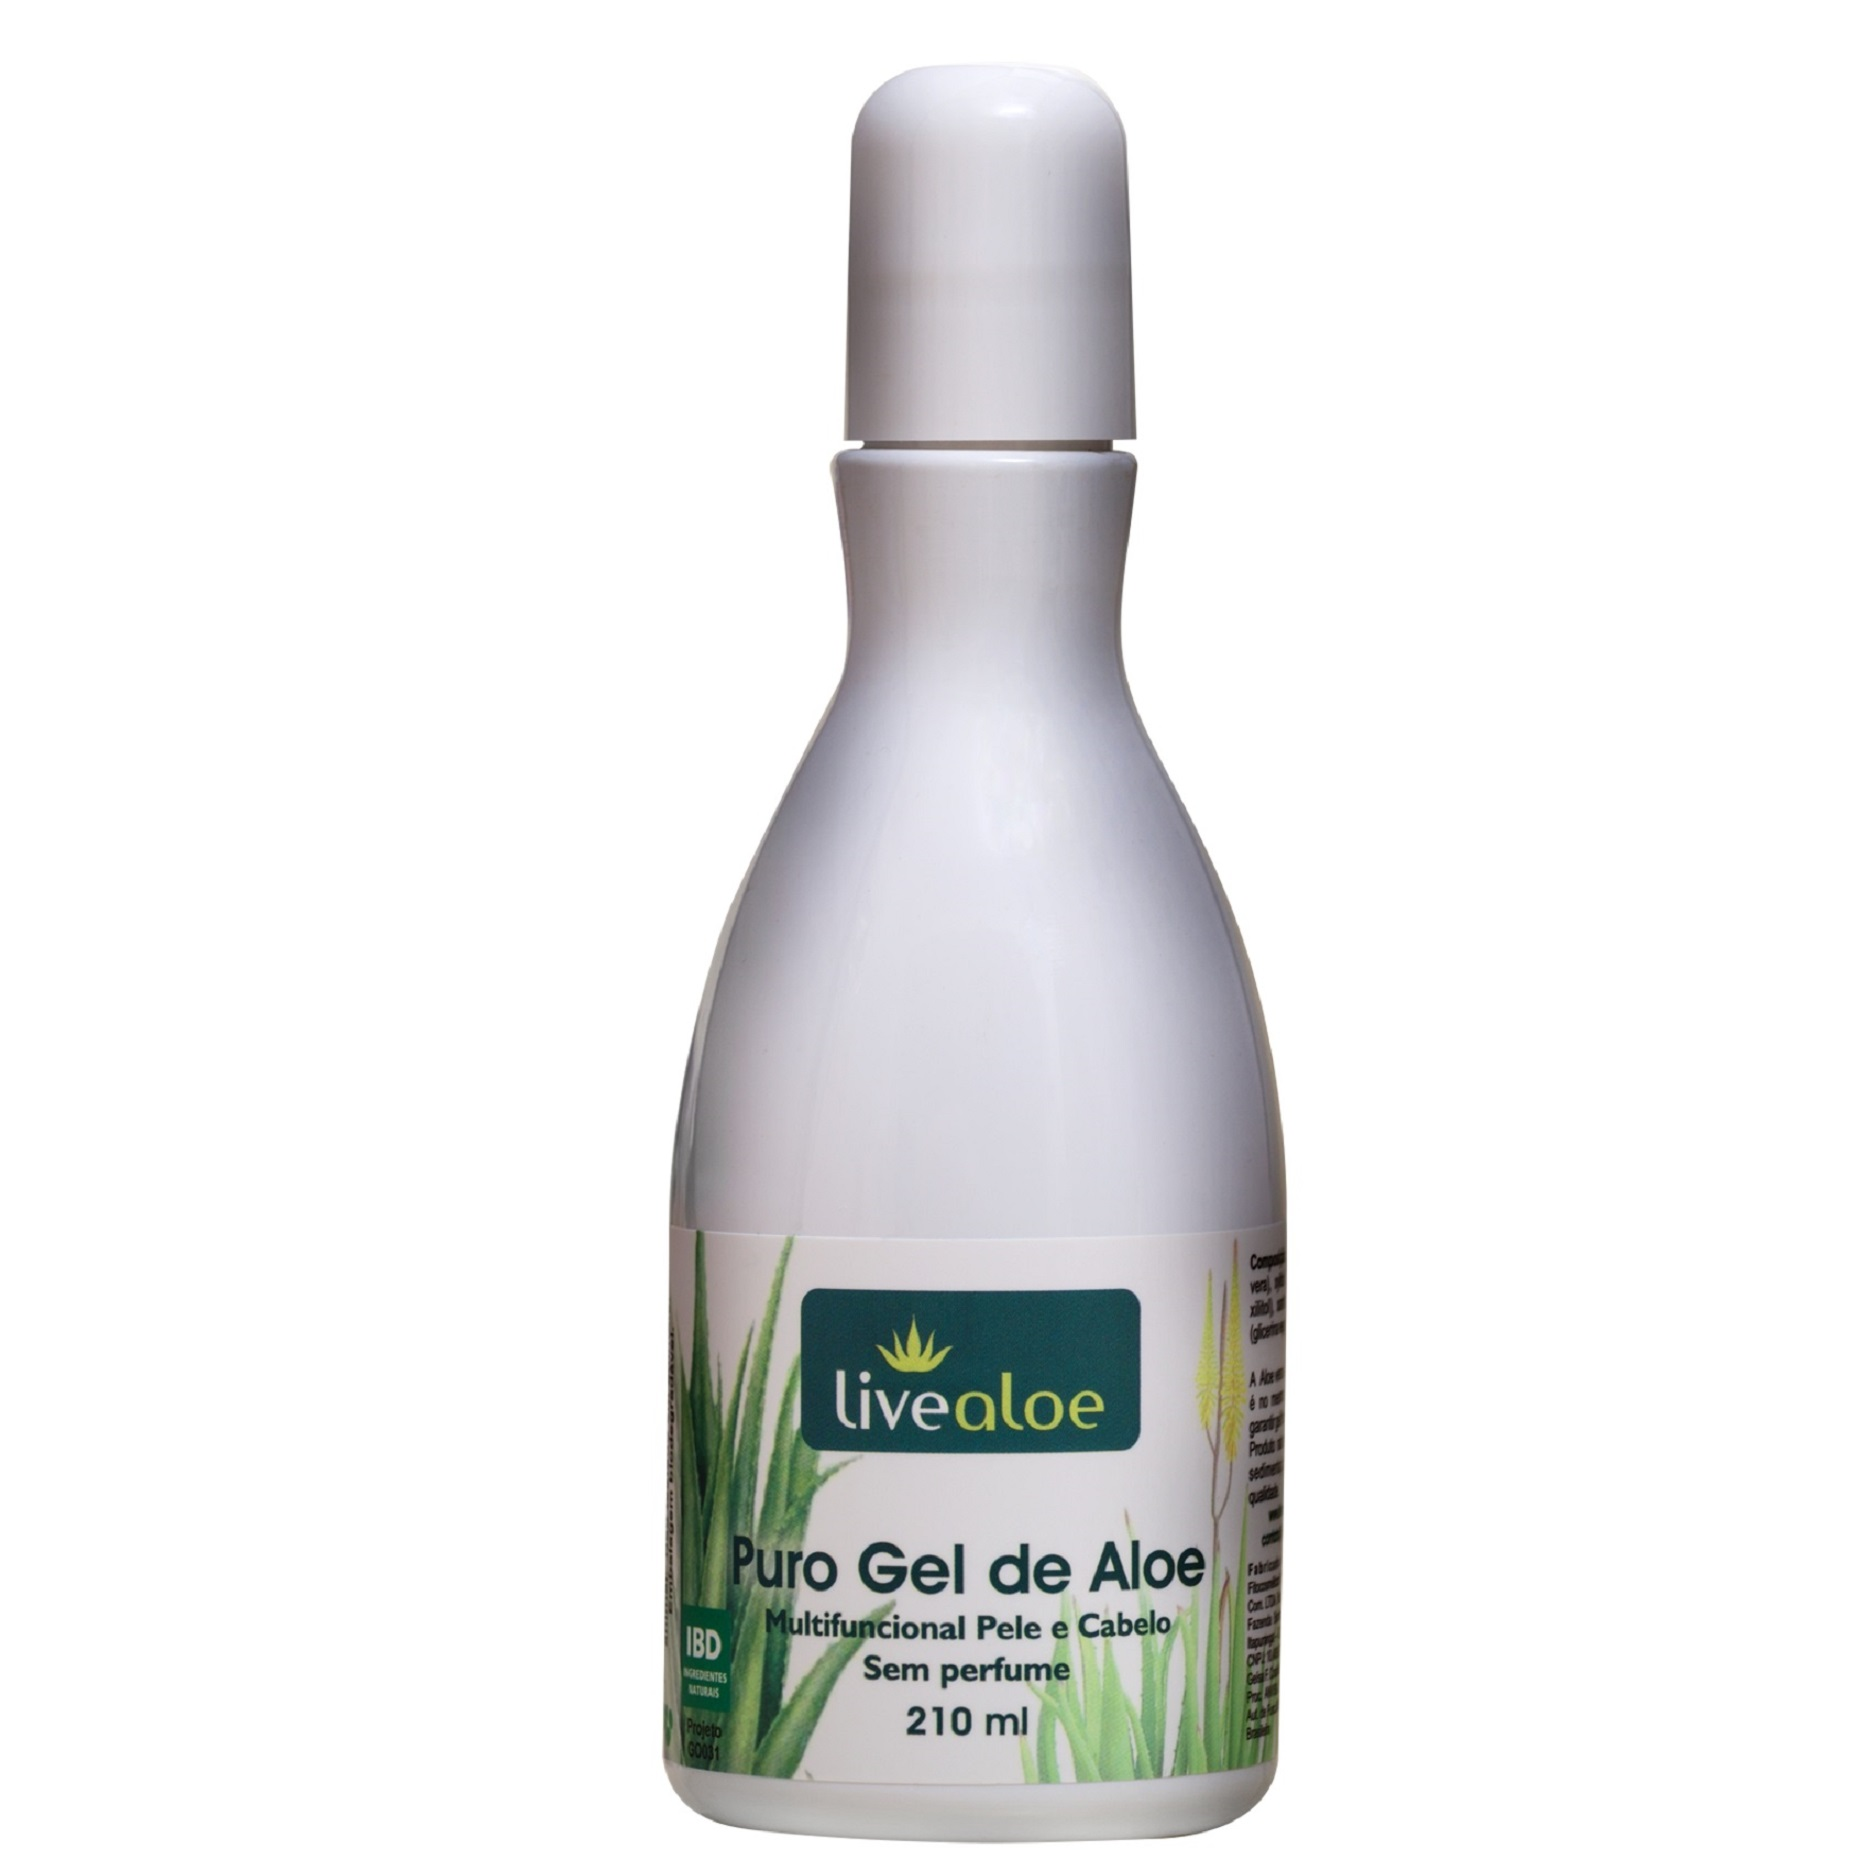 PURO GEL DE ALOE - 60 ML ou 210 ml ou 500ml - LIVEALOE